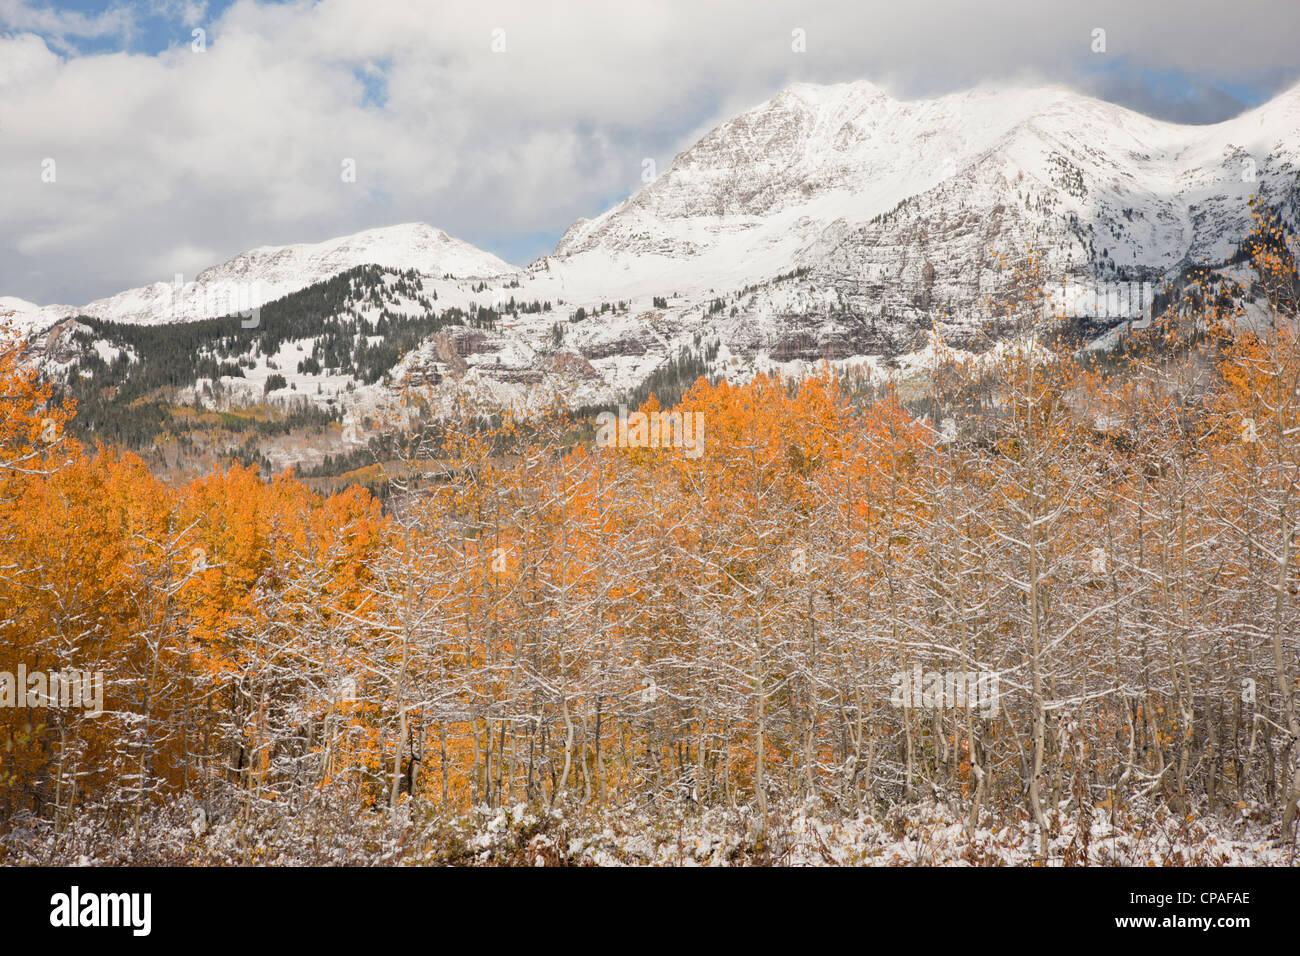 USA, Colorado, Gunnison National Forest, Mt. Owen. Aspen trees after an autumn snowstorm - Stock Image